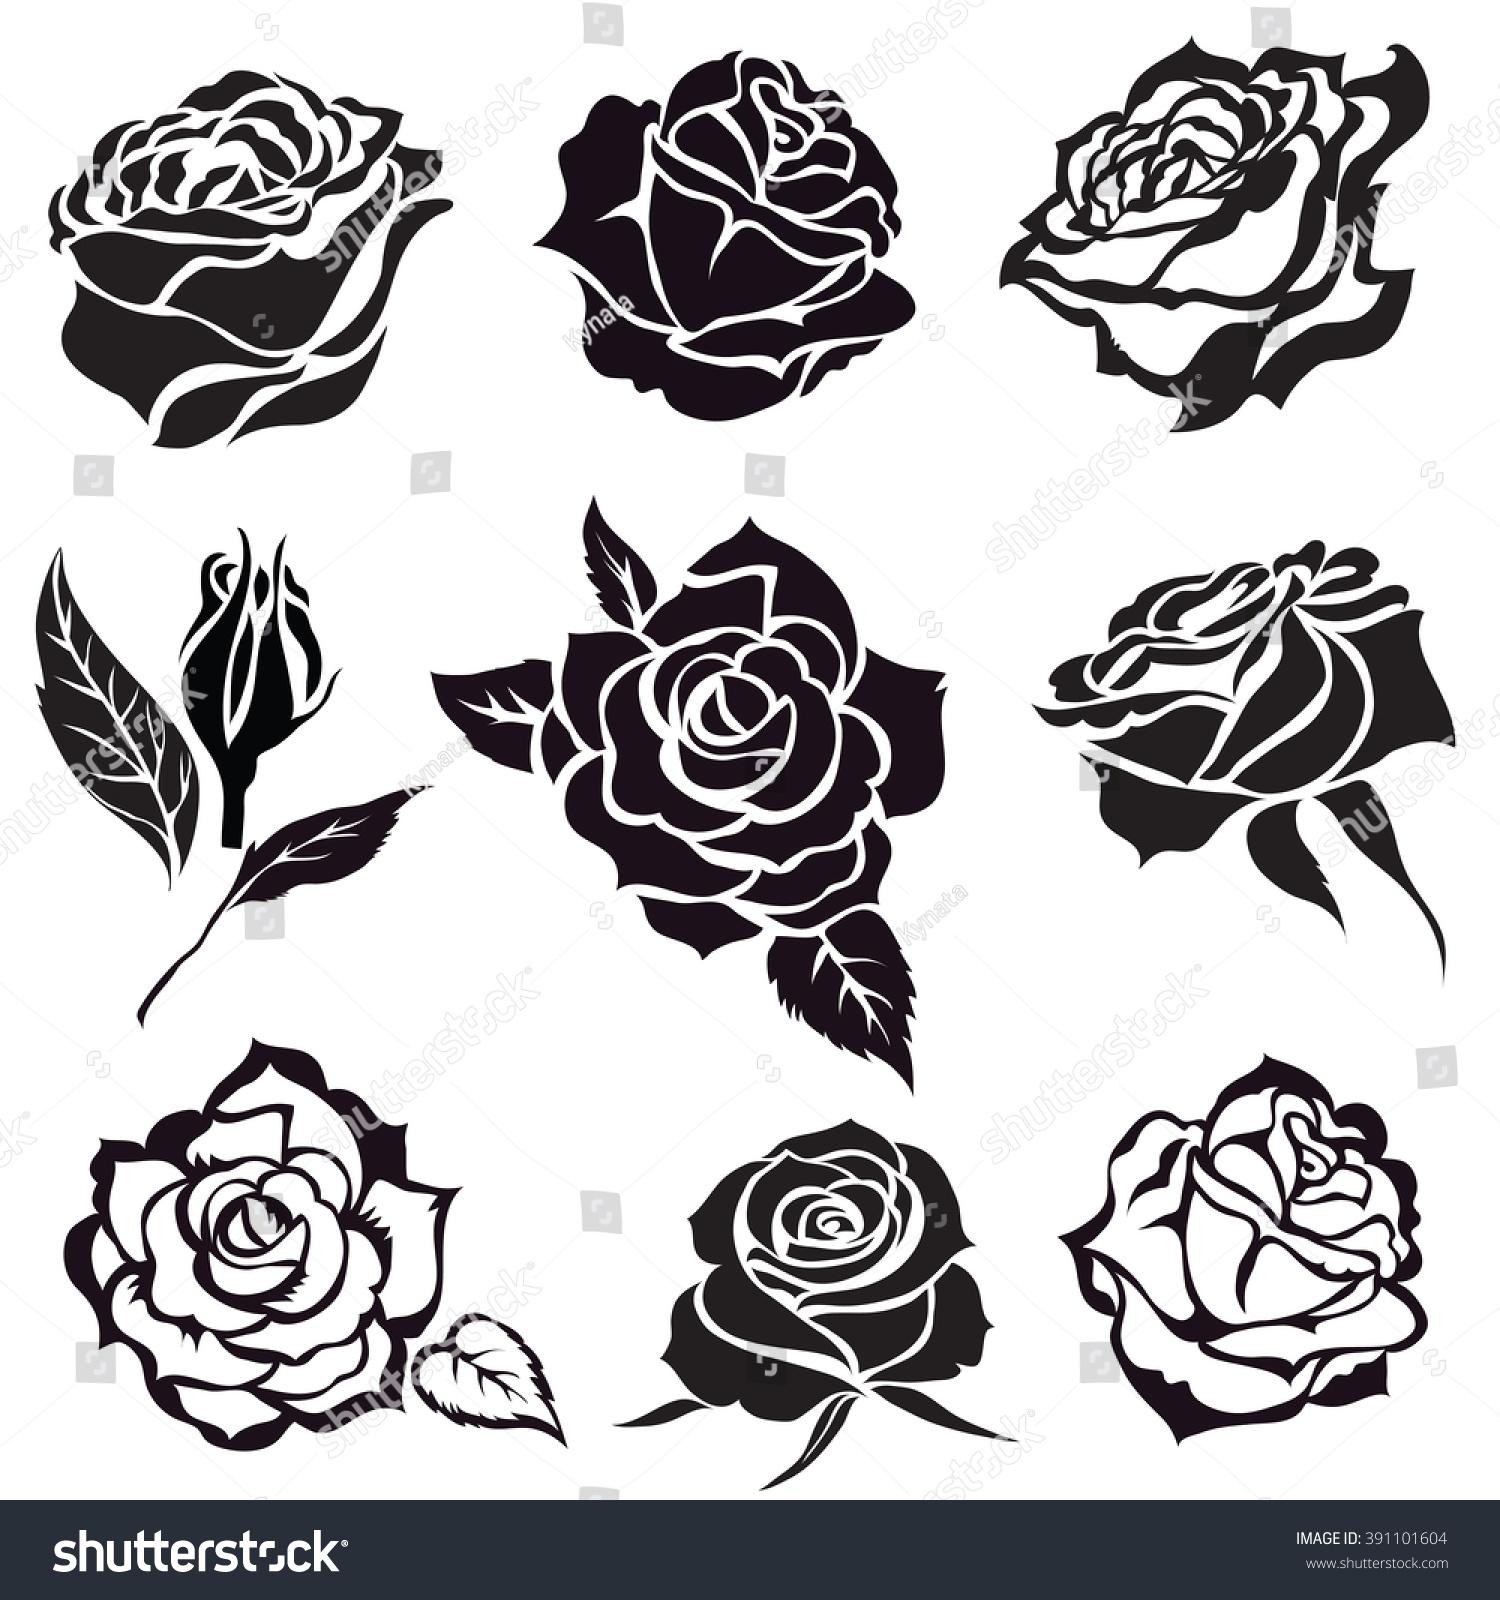 Set Of Black Flower Design Elements Vector Illustration: Set Vector Black Rose Flower Design Stock Vector 391101604